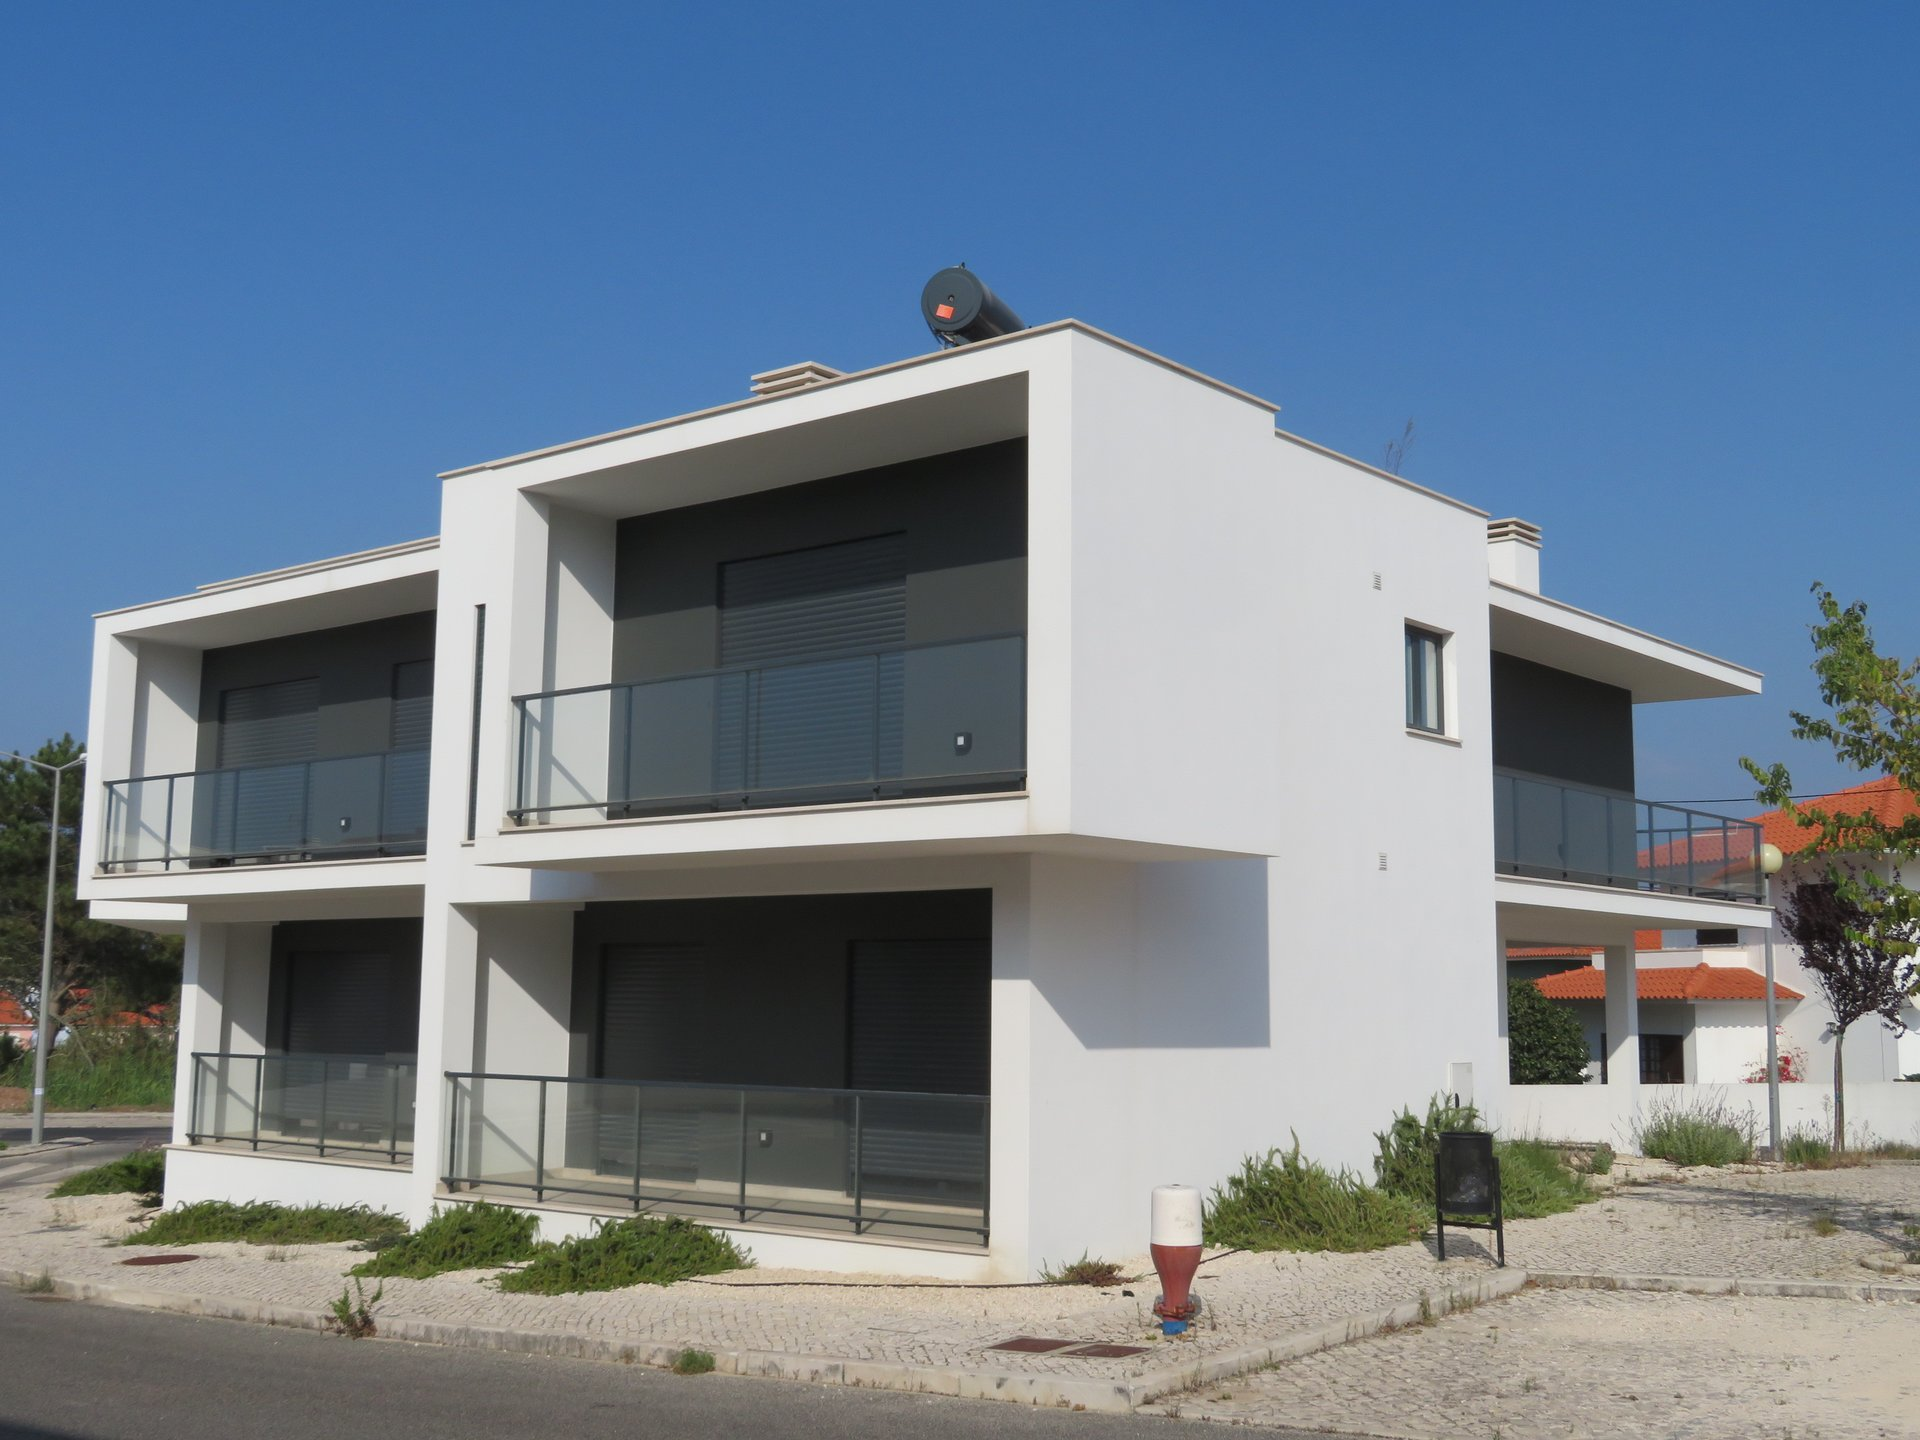 2 Bedroom Apartment Sao Martinho do Porto, Silver Coast Ref: AA354